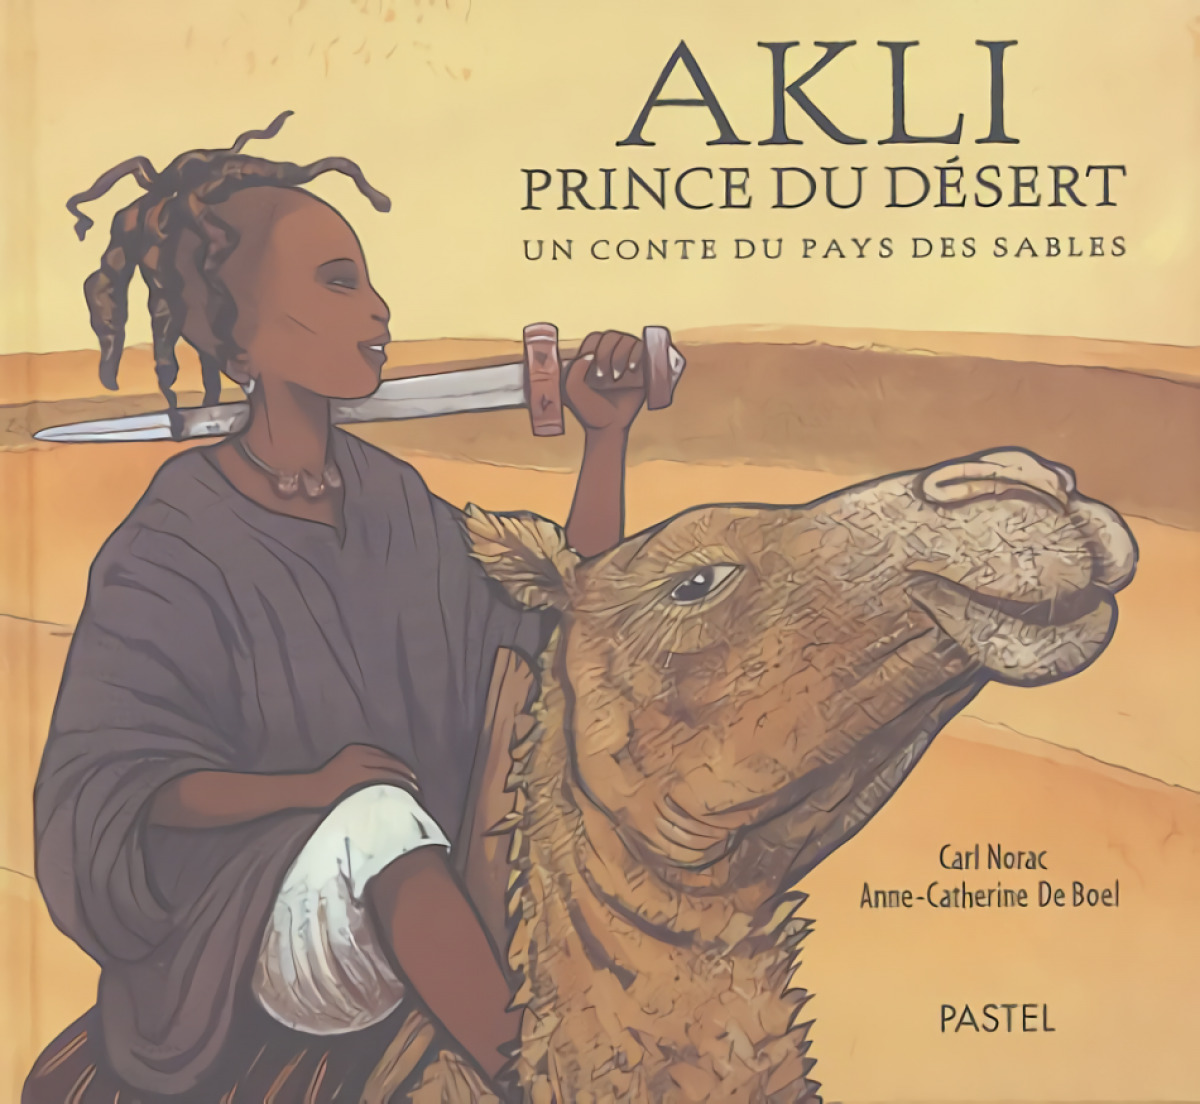 Akli,prince du desert